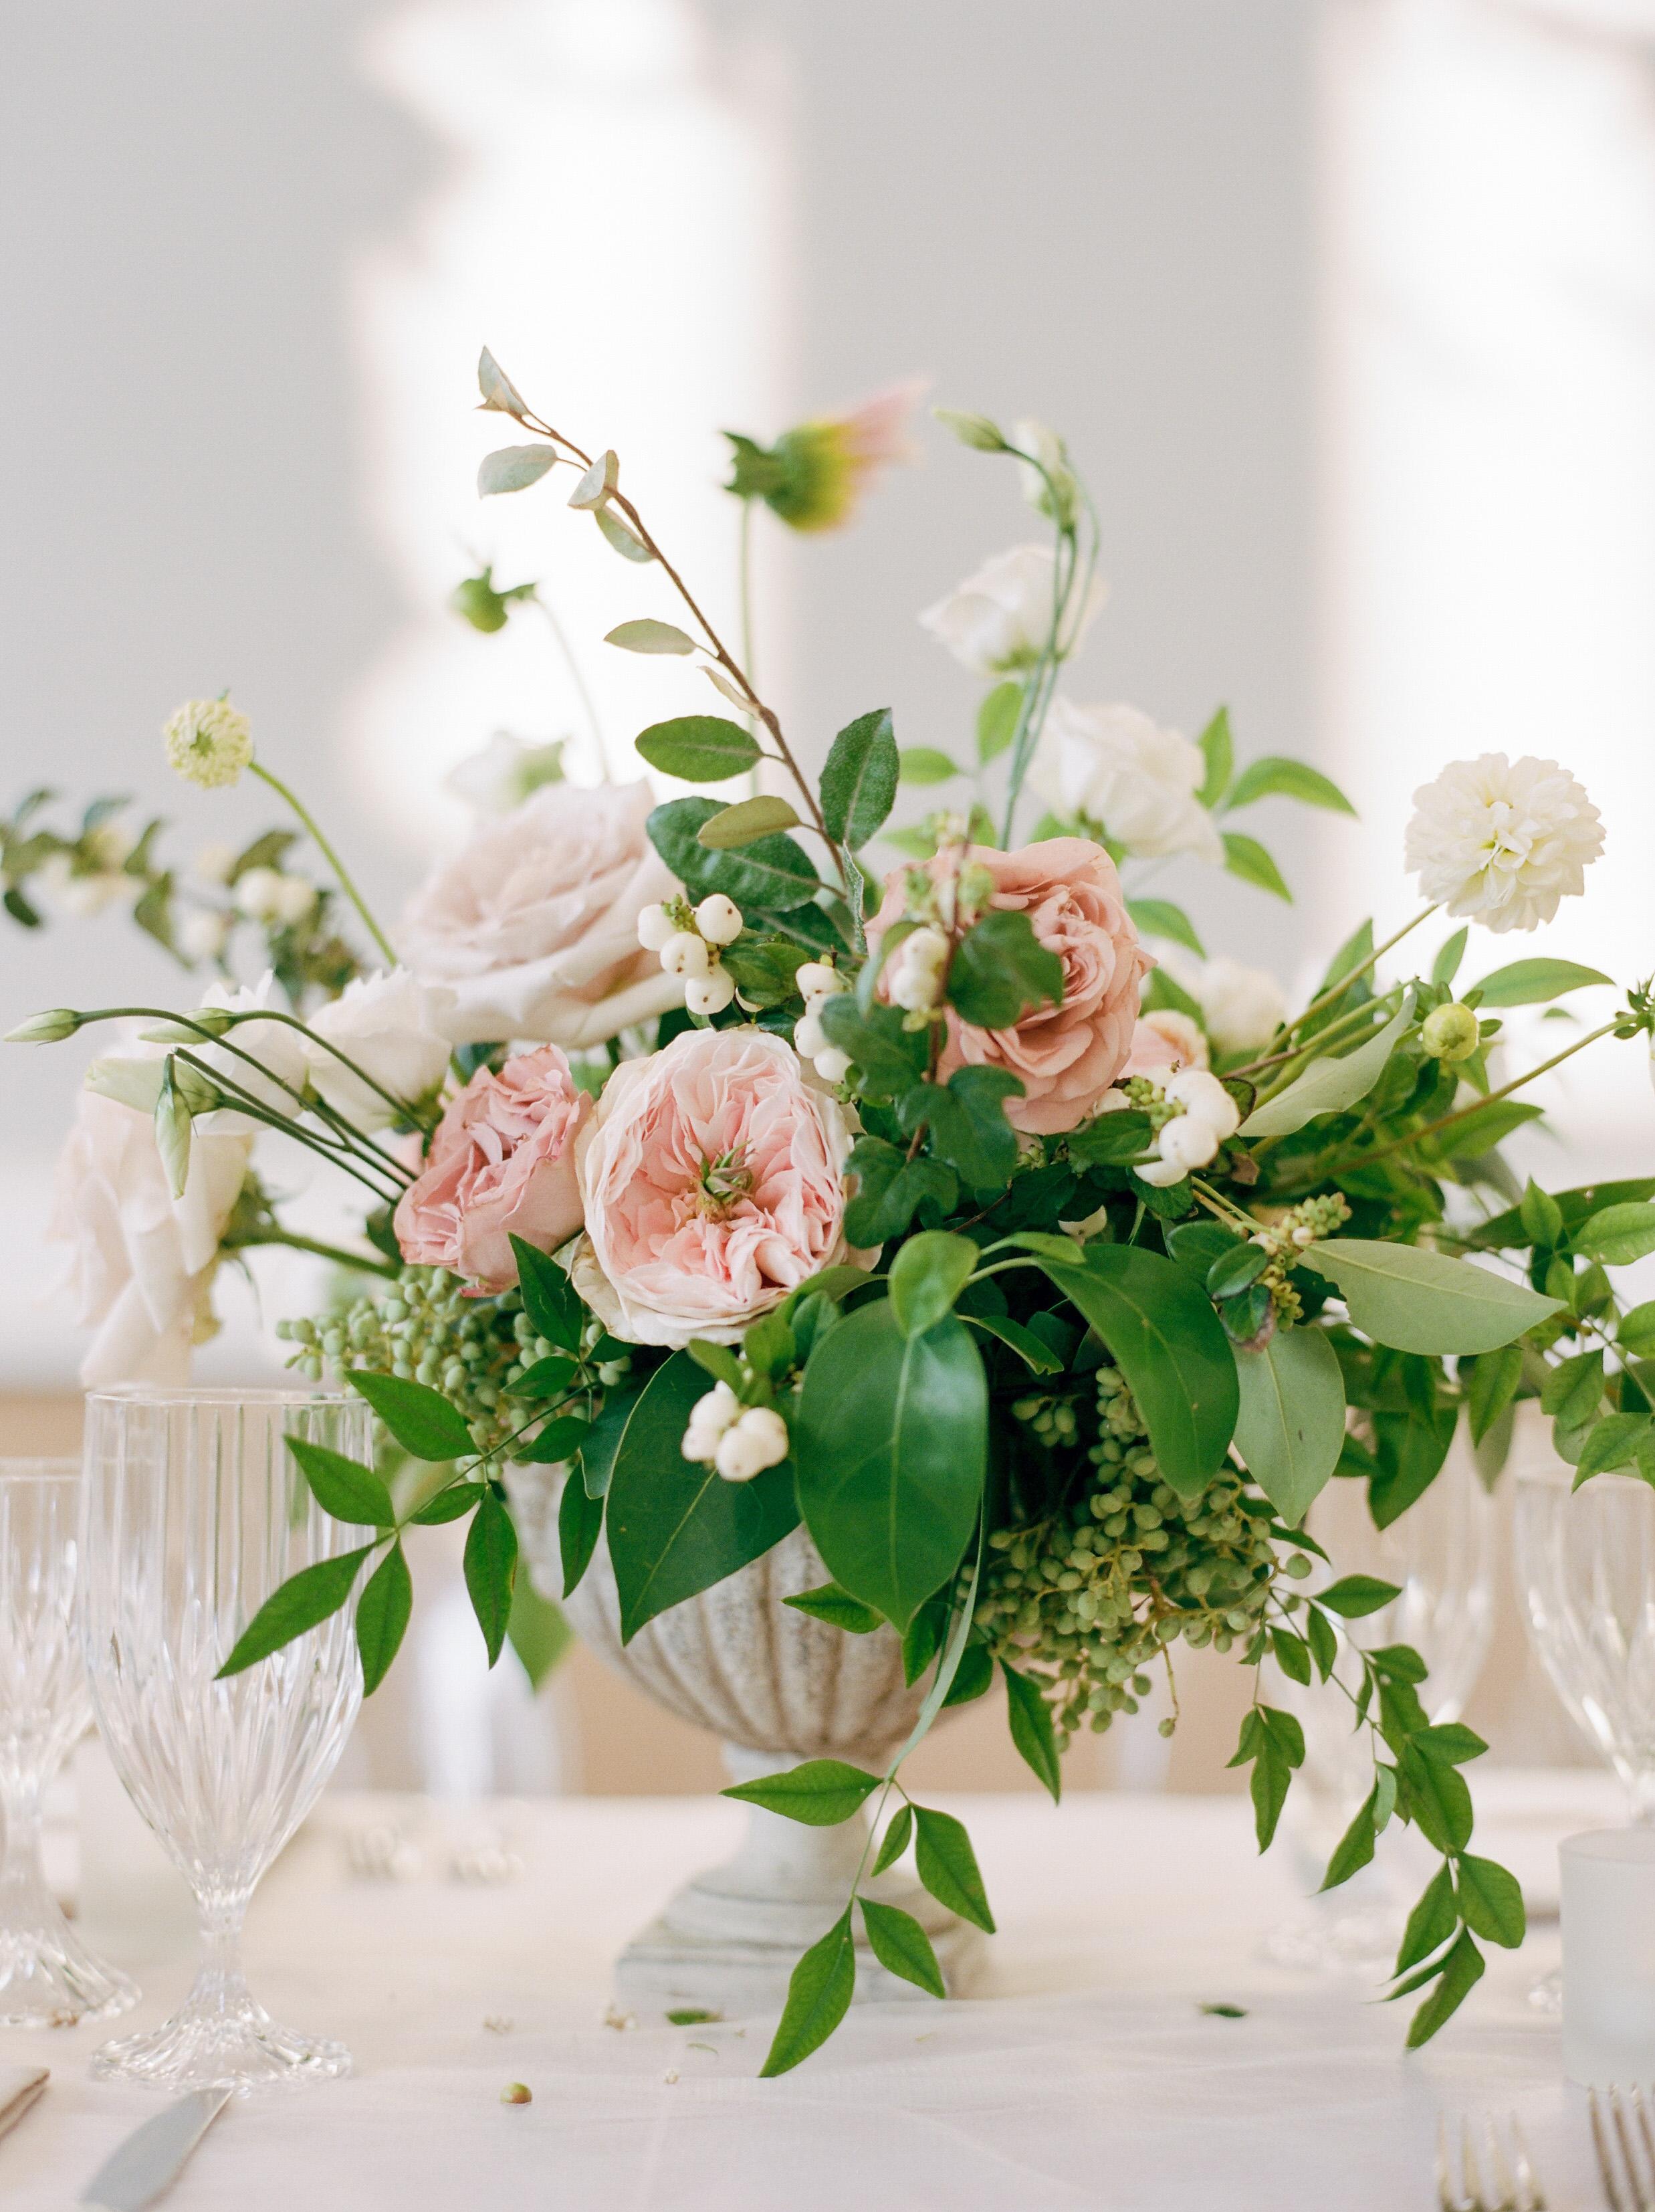 Martha-Stewart-Wedding-Dana-Fernandez-Photography-Josh-Texas-Film-Houston-Wedding-Fine-Art-Photographer-McGovern-Centennial-Gardens-Top-Best-216.jpg